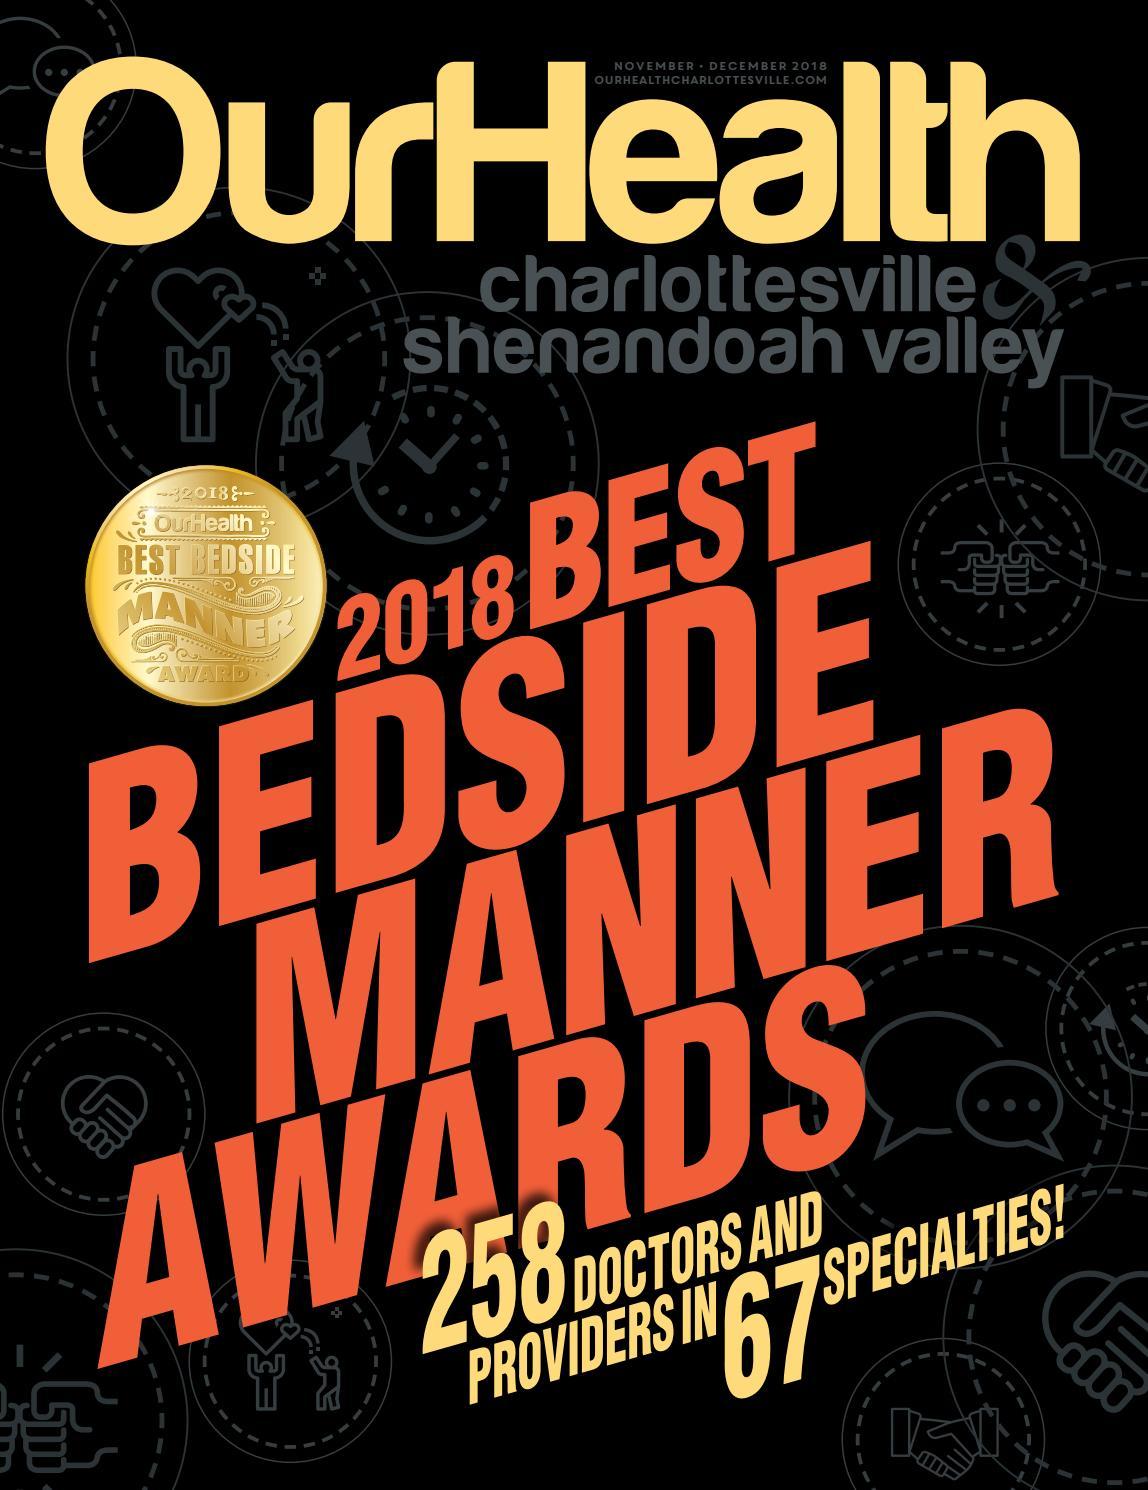 OurHealth Charlottesville & Shenandoah Valley Magazine